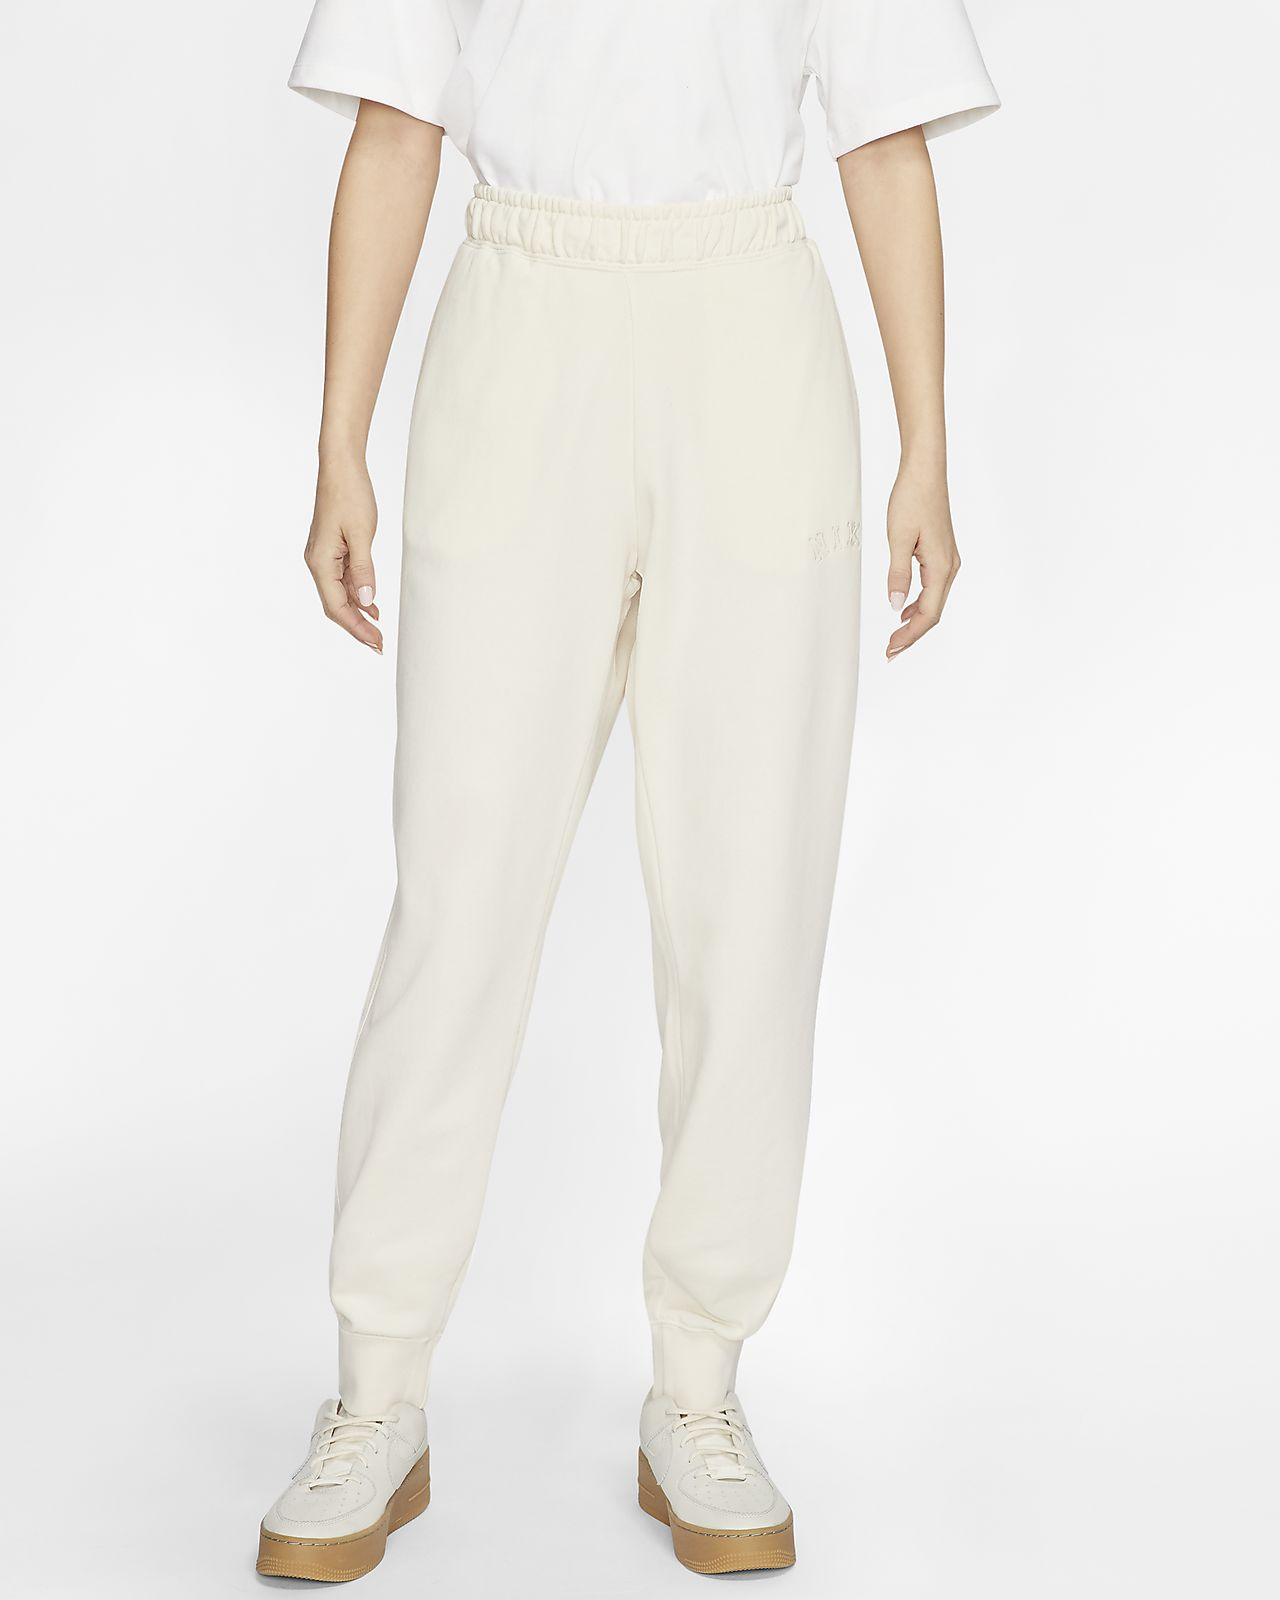 Nike Sportswear-frottébukser til kvinder